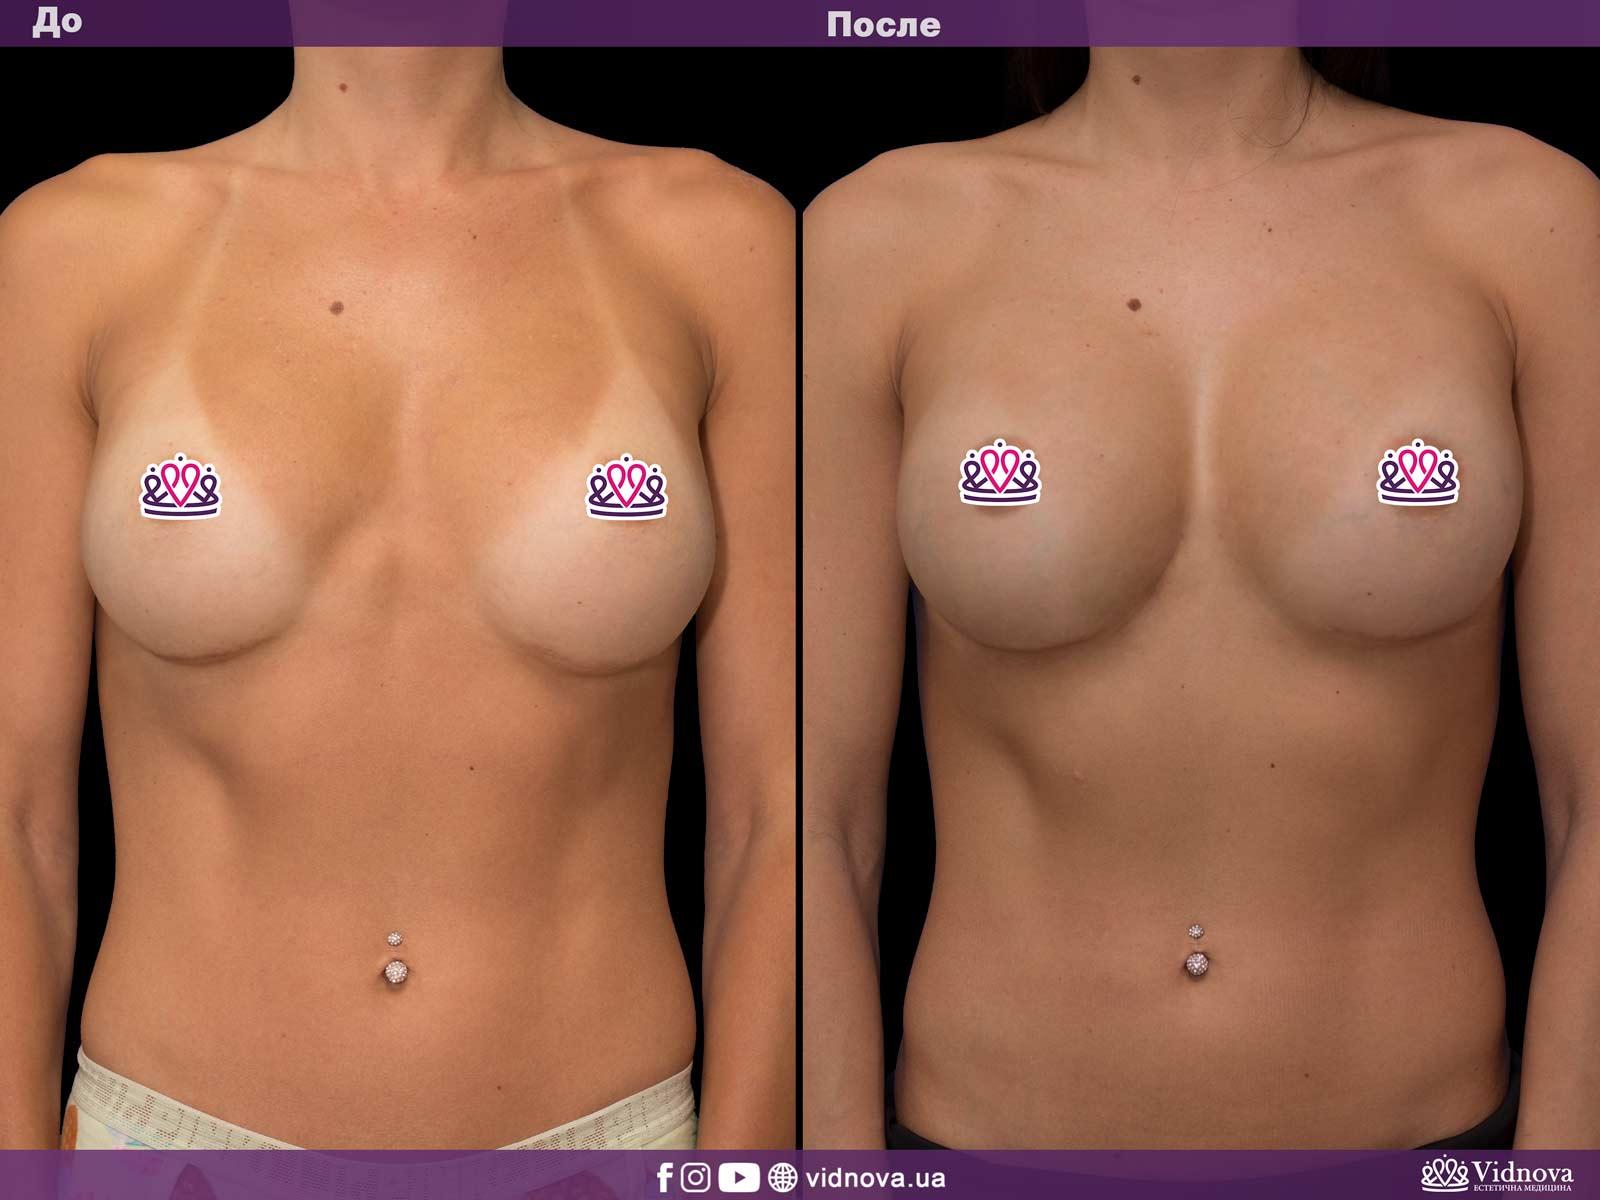 Увеличение груди: Фото ДО и ПОСЛЕ - Пример №33-1 - Клиника Vidnova